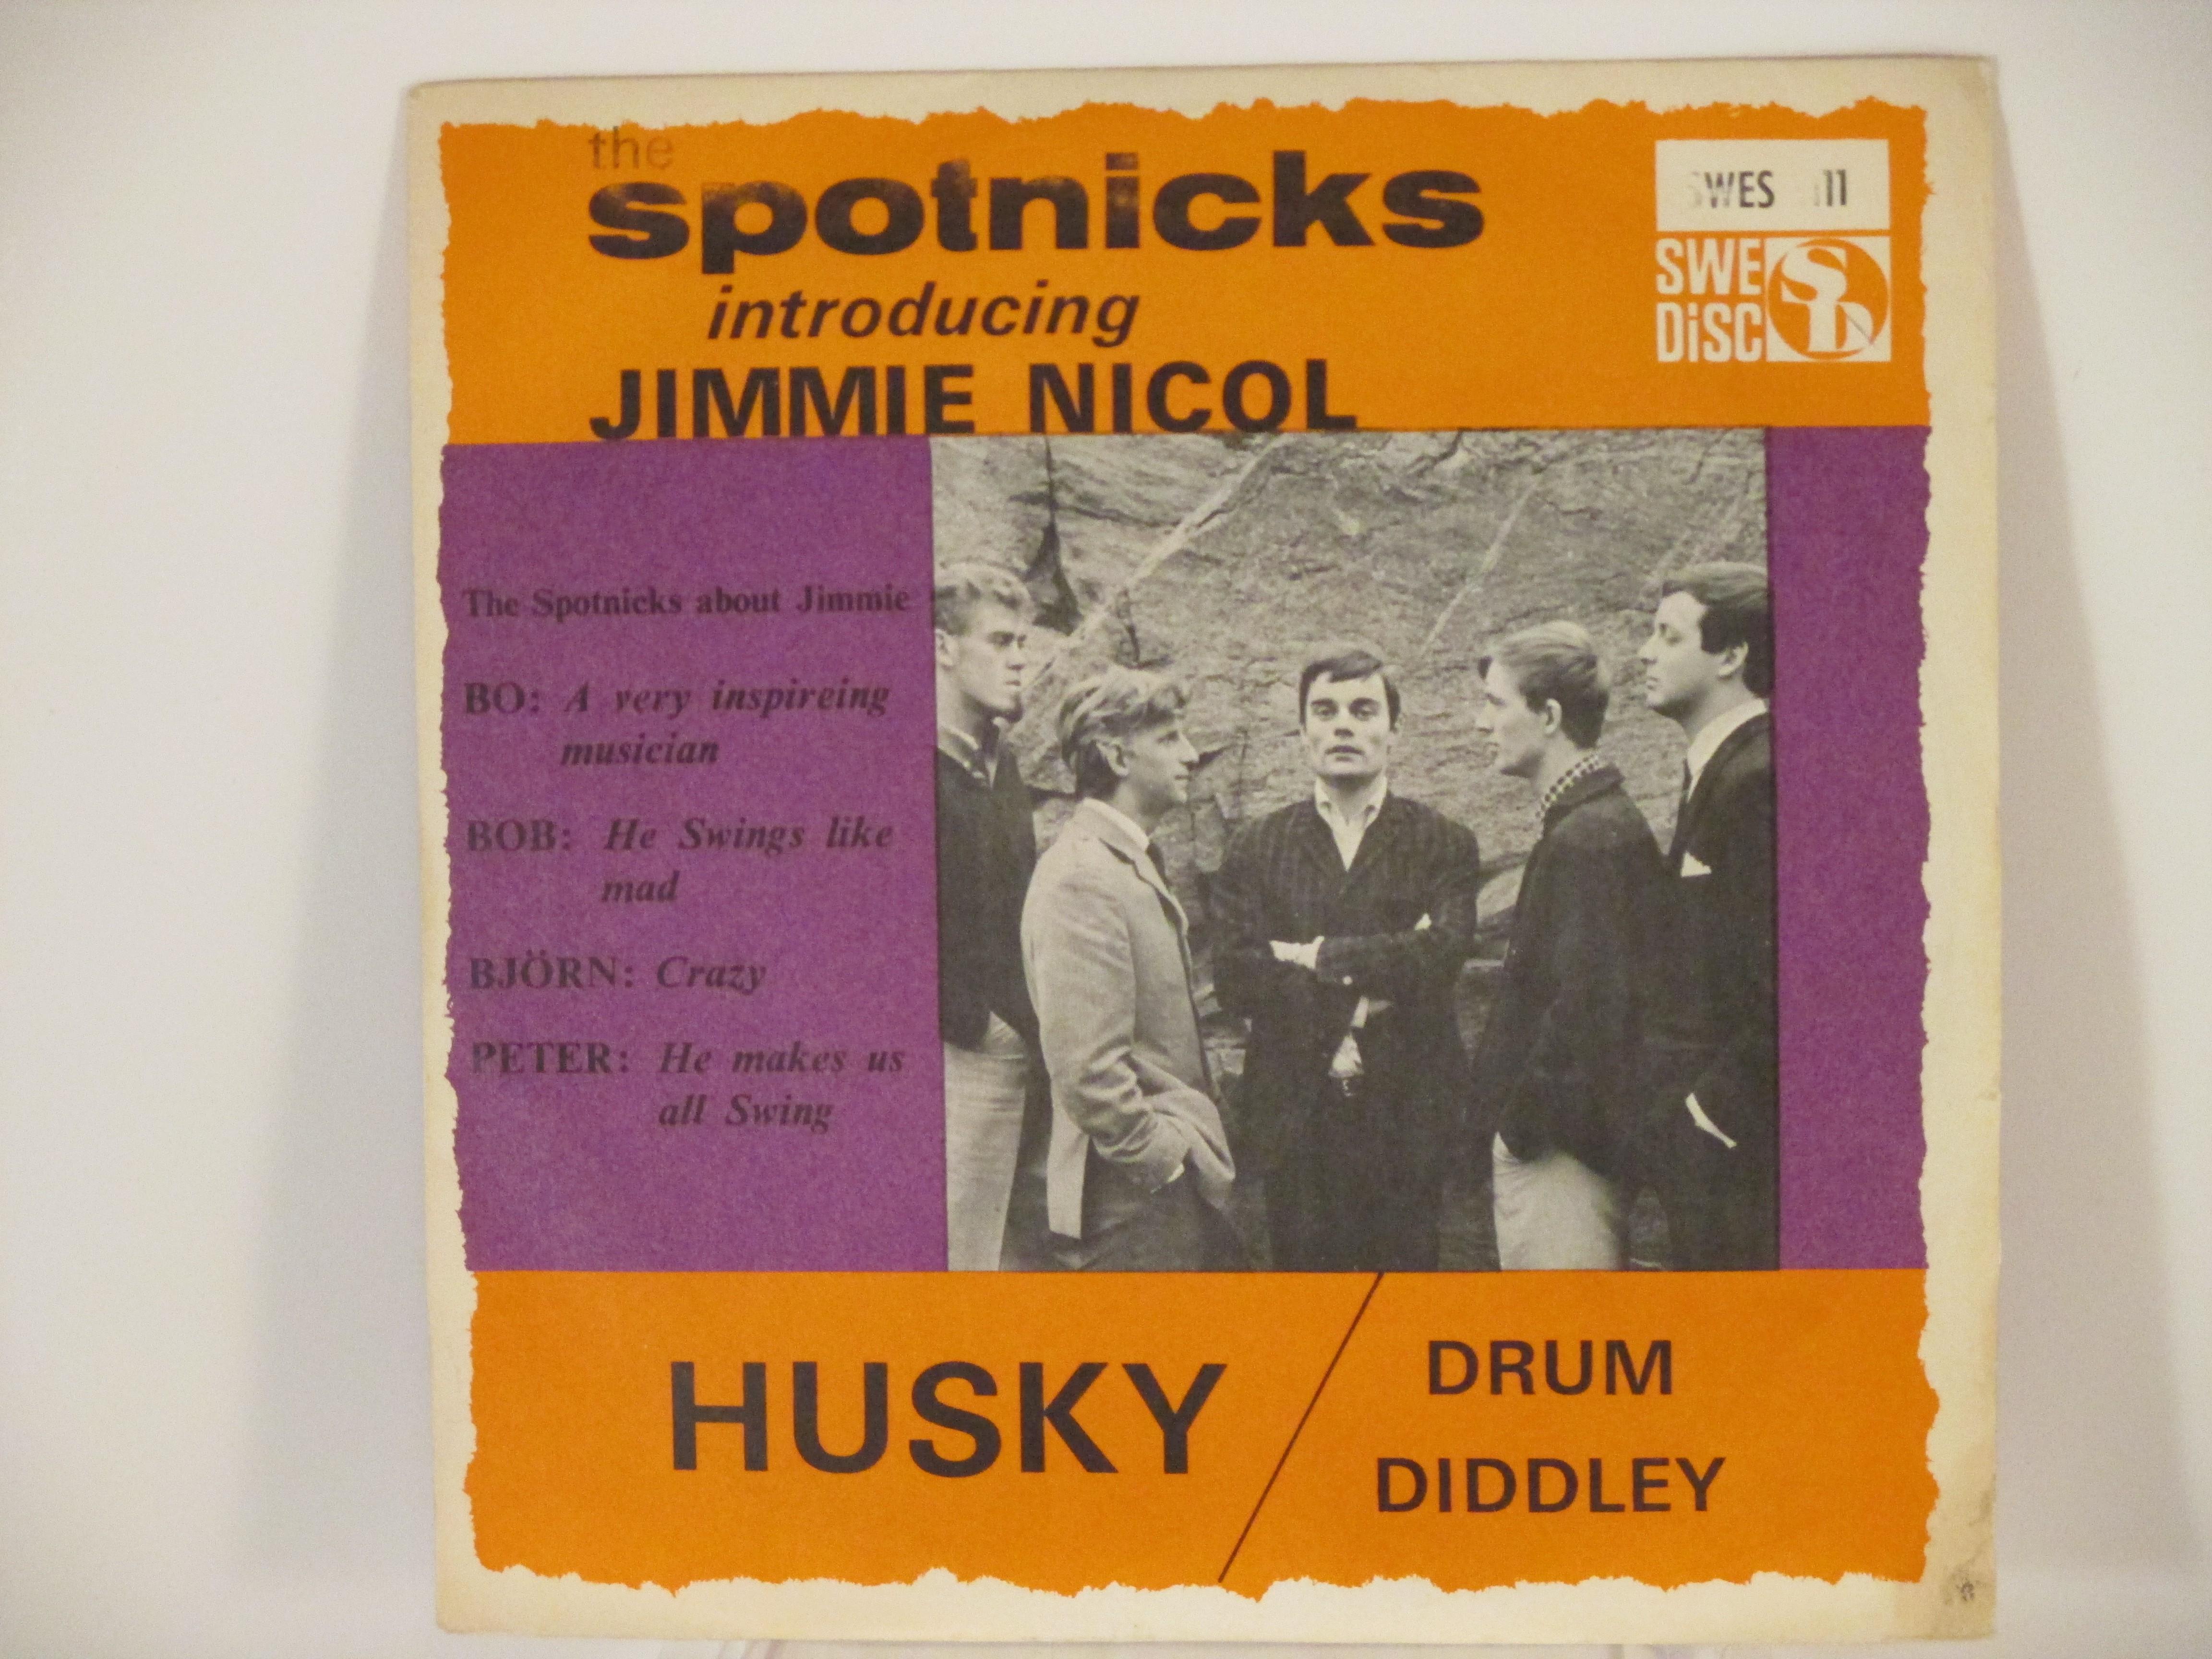 SPOTNICKS : Husky / Drum Diddley